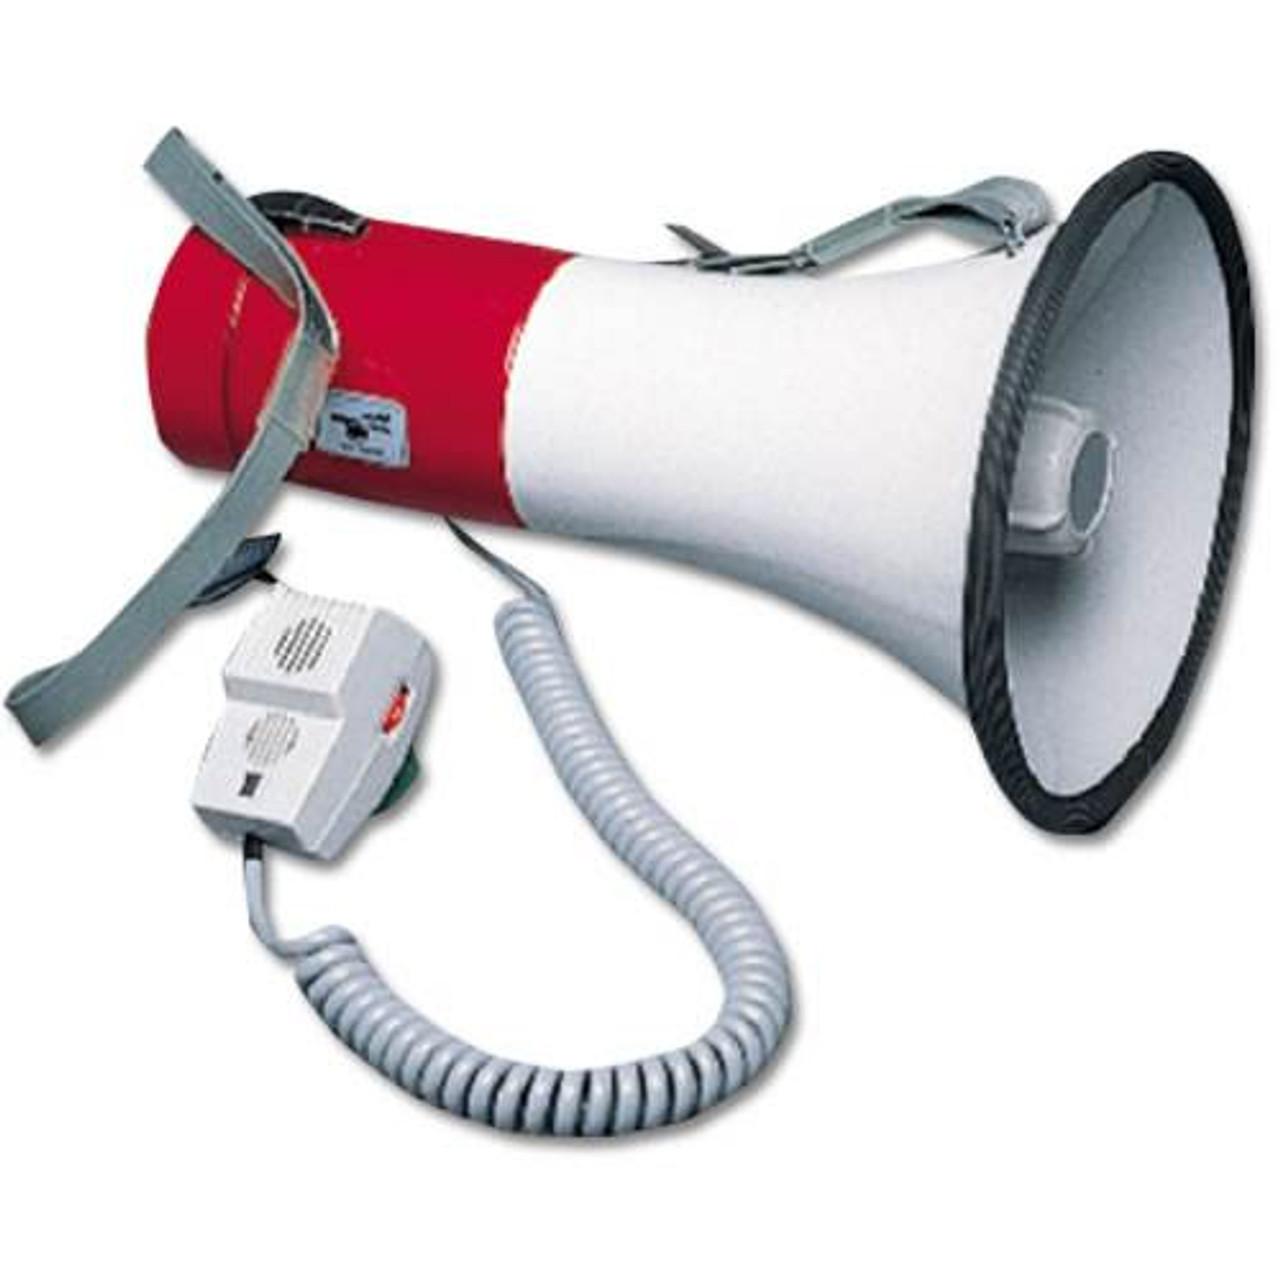 1,000-Yard Megaphone with HandHeld Microphone